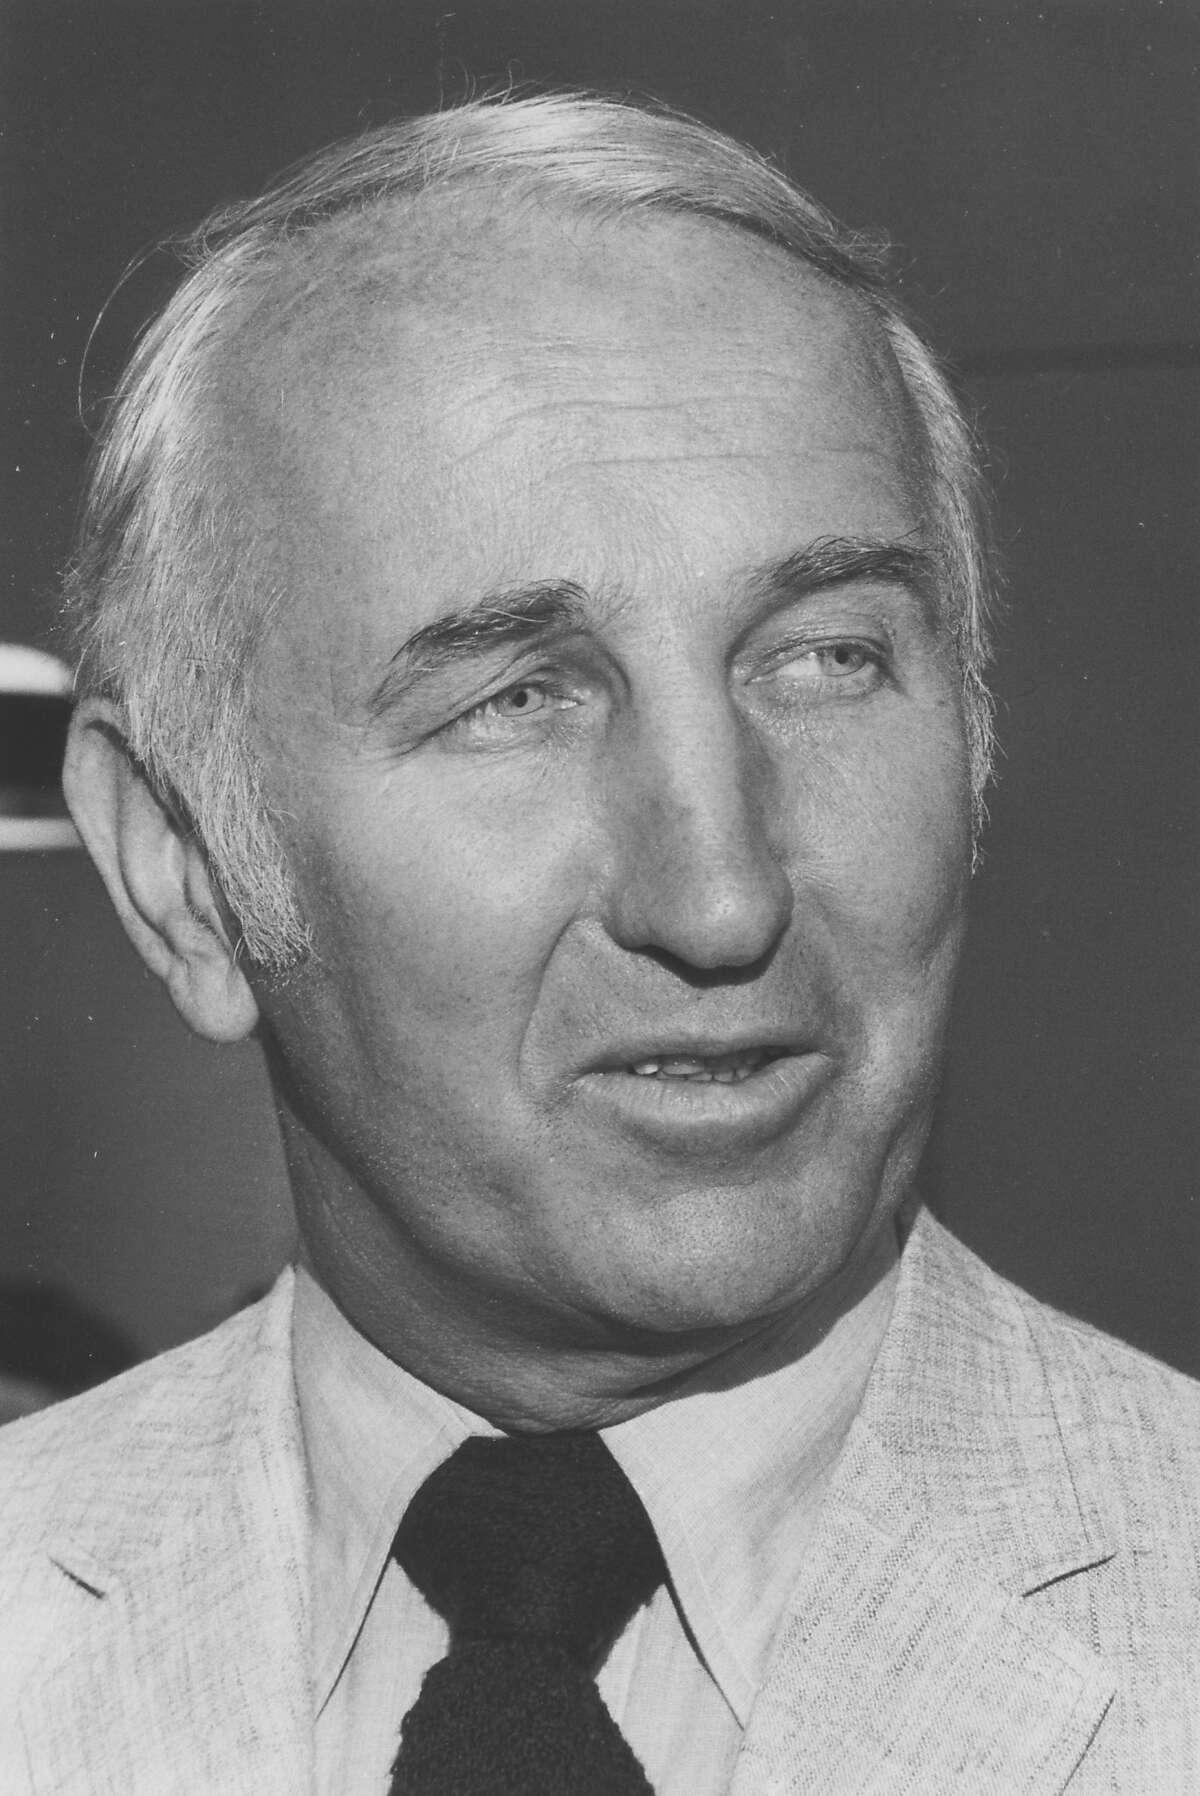 Henry Adams, the developer of the Showshoplace , 2 Kansas Street, San Francisco. Photo was taken: 09/15/1972.